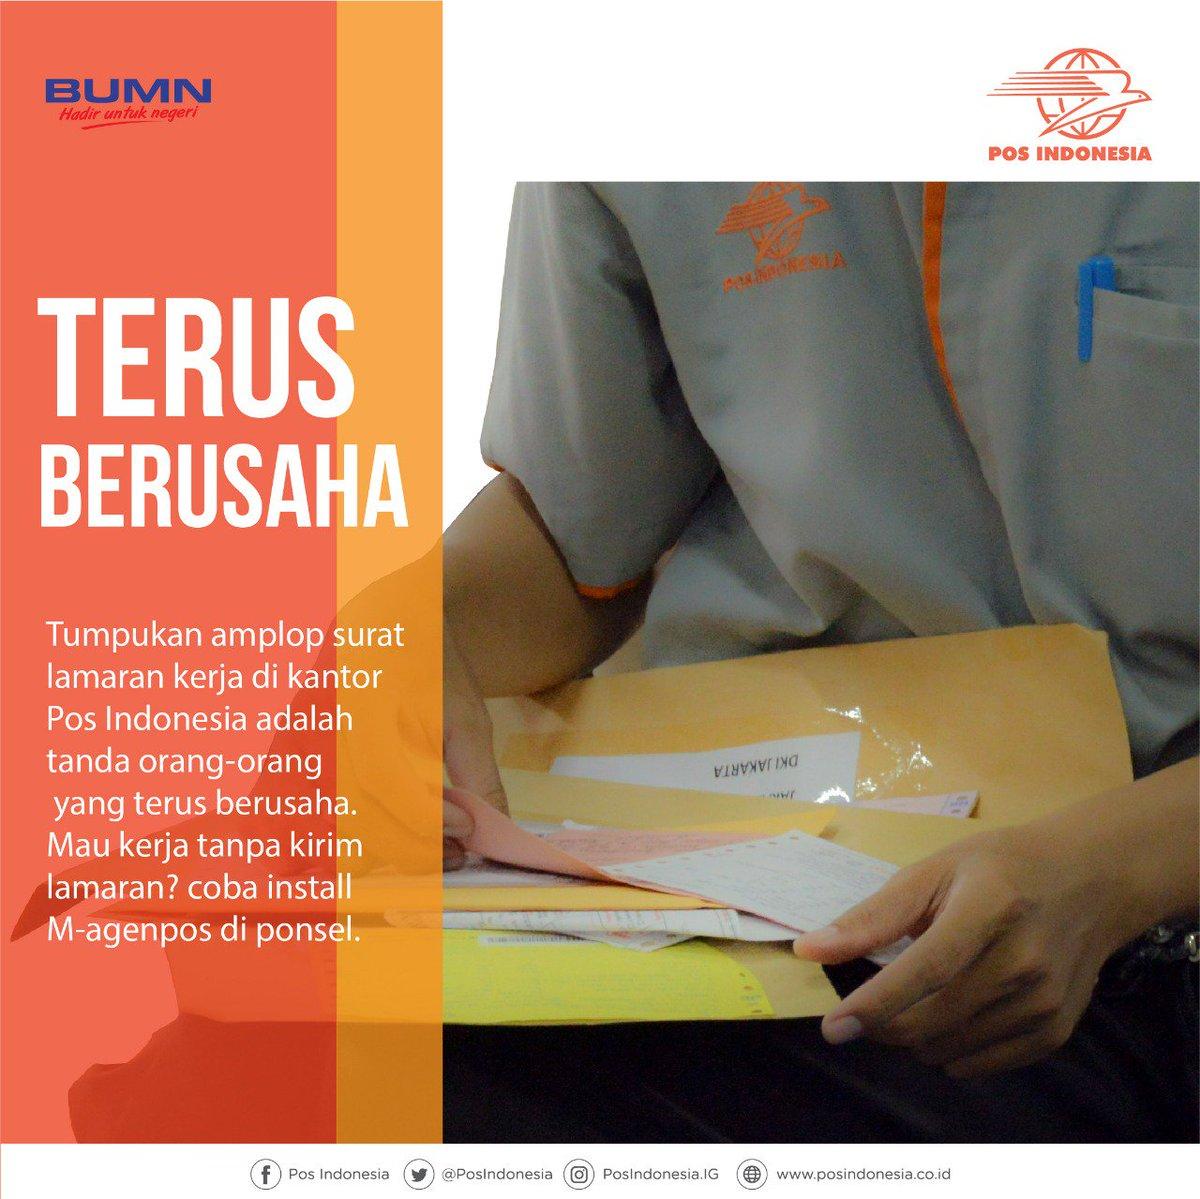 Pos Indonesia على تويتر Tumpukan Amplop Surat Lamaran Kerja Di Kantor Pos Indonesia Adalah Tanda Orang Orang Yang Terus Berusaha Mau Kerja Tanpa Kirim Lamaran Coba Install M Agenpos Di Ponsel Agenpos Posinaja Posindonesia